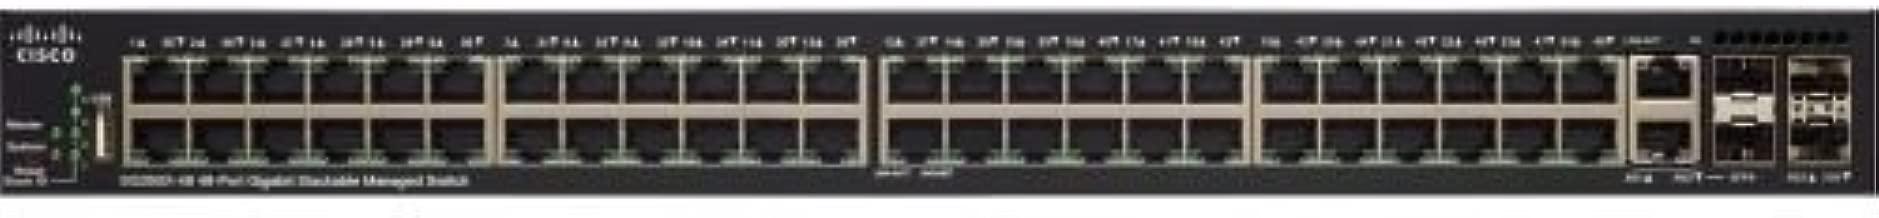 Cisco SG350X-48MP 48-Port Gigabit PoE Stackable Managed Switch